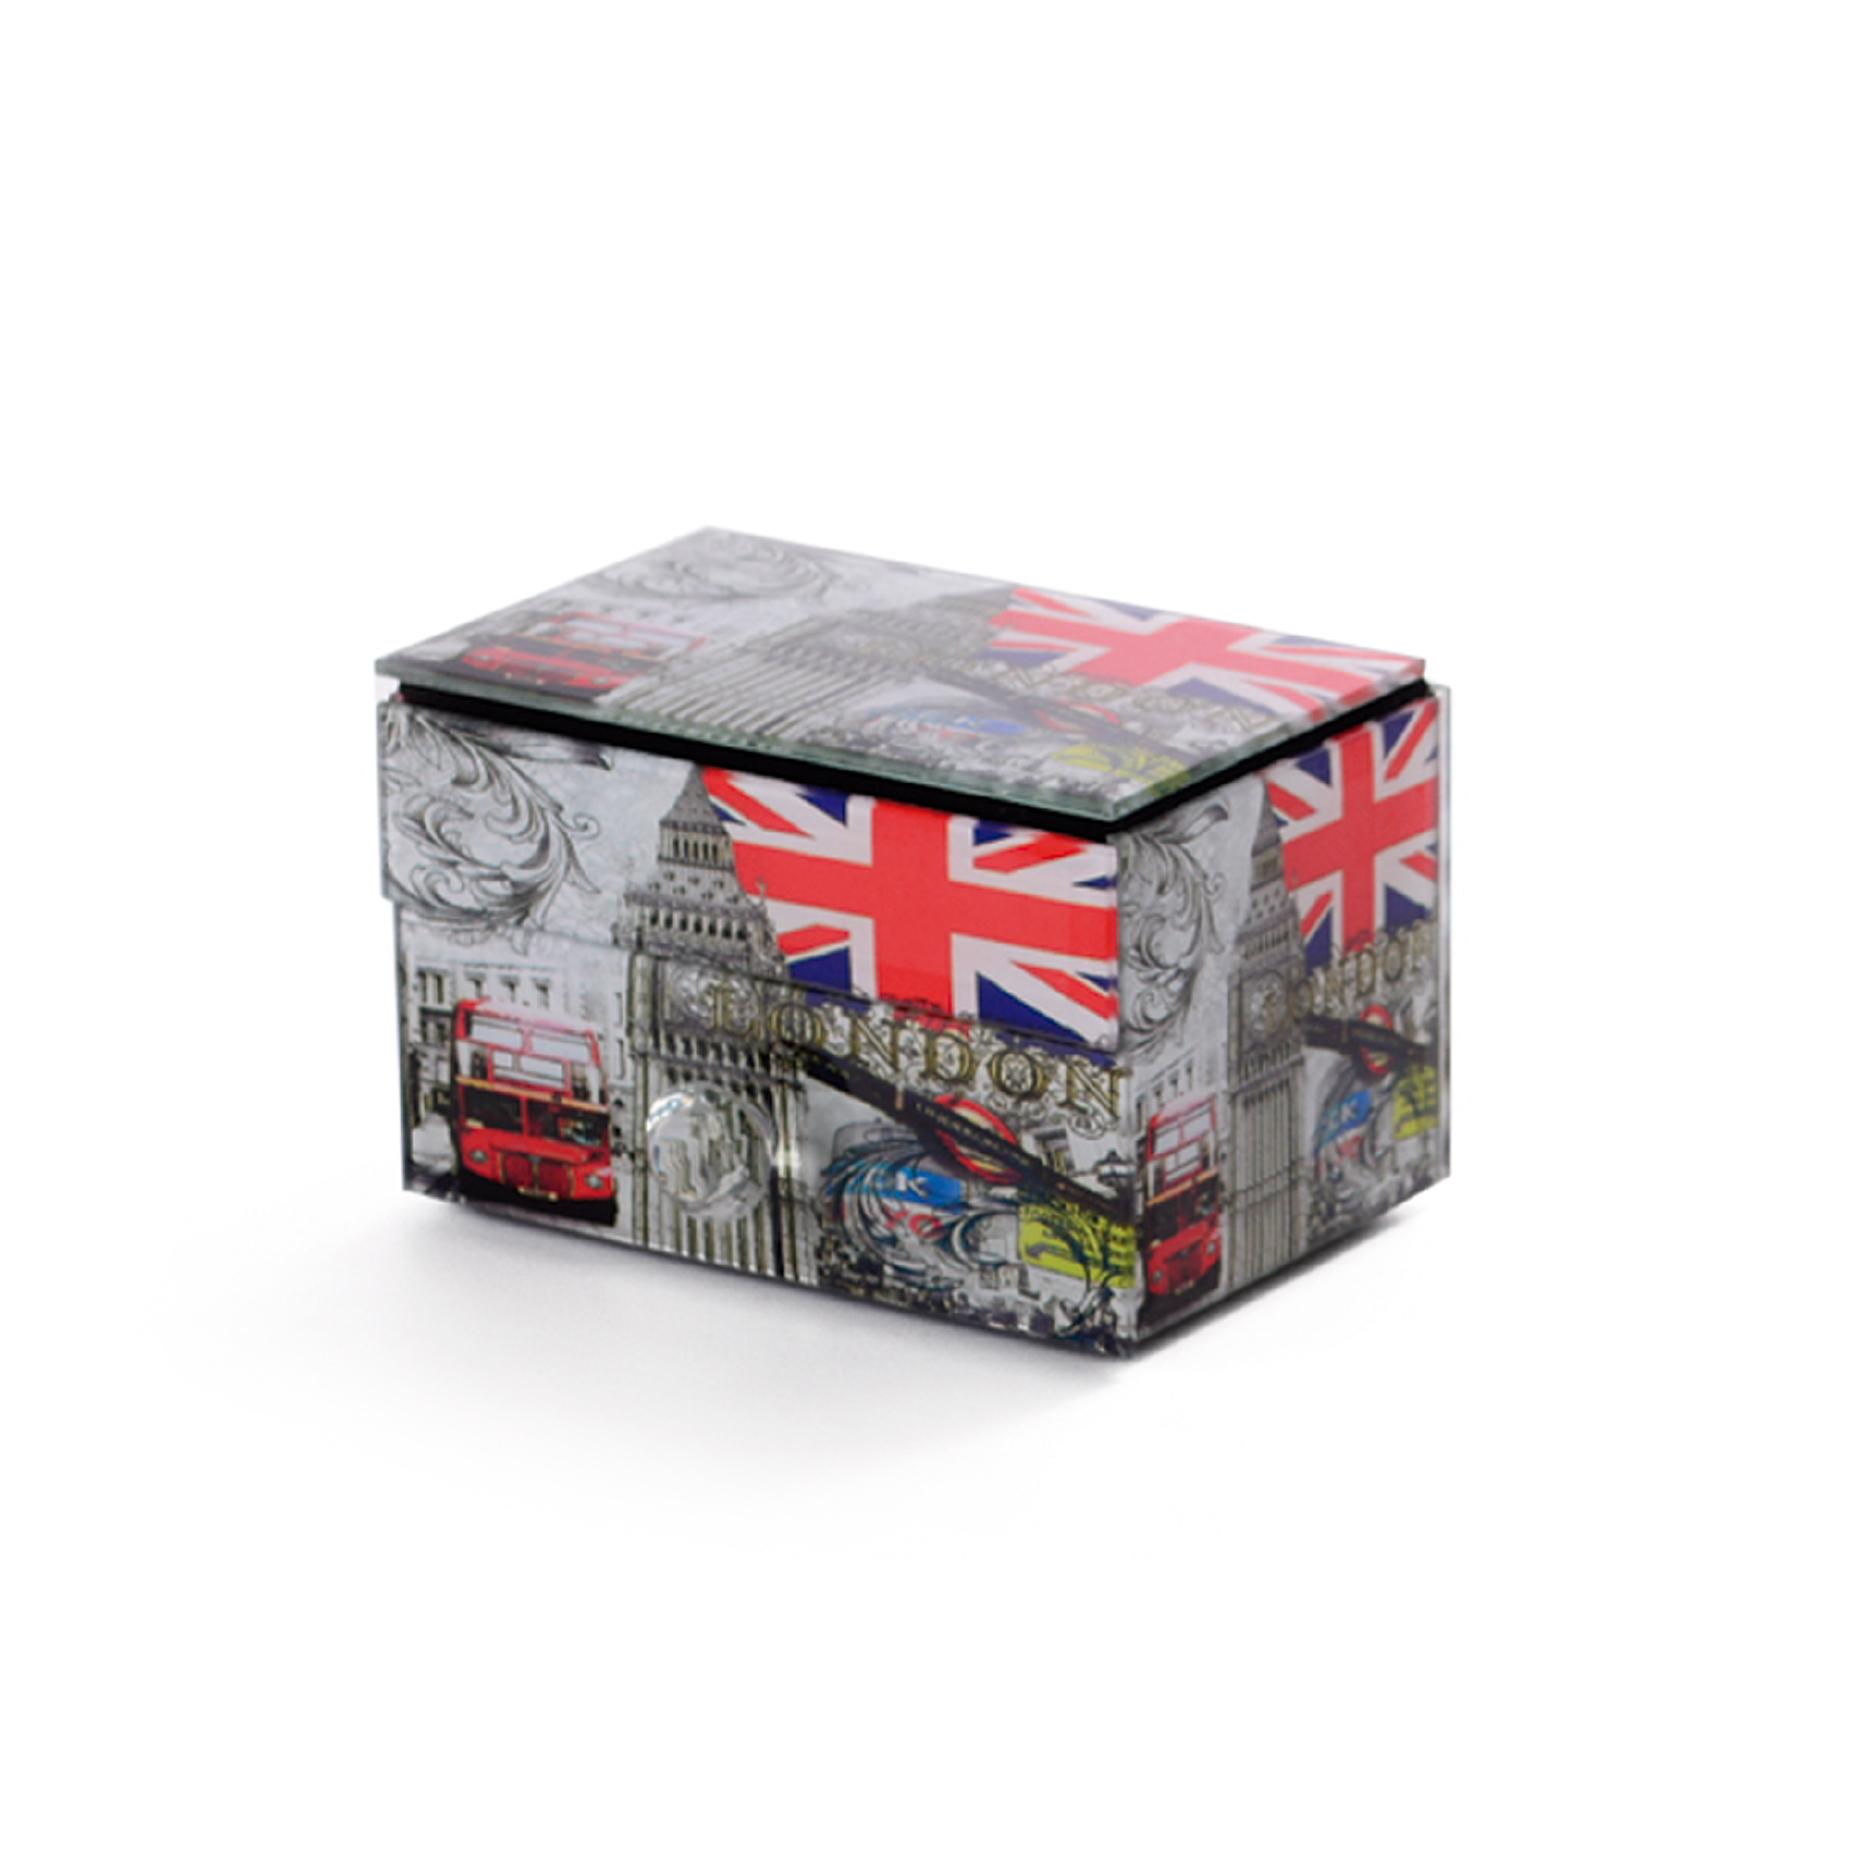 Caixa porta objetos Inglaterra